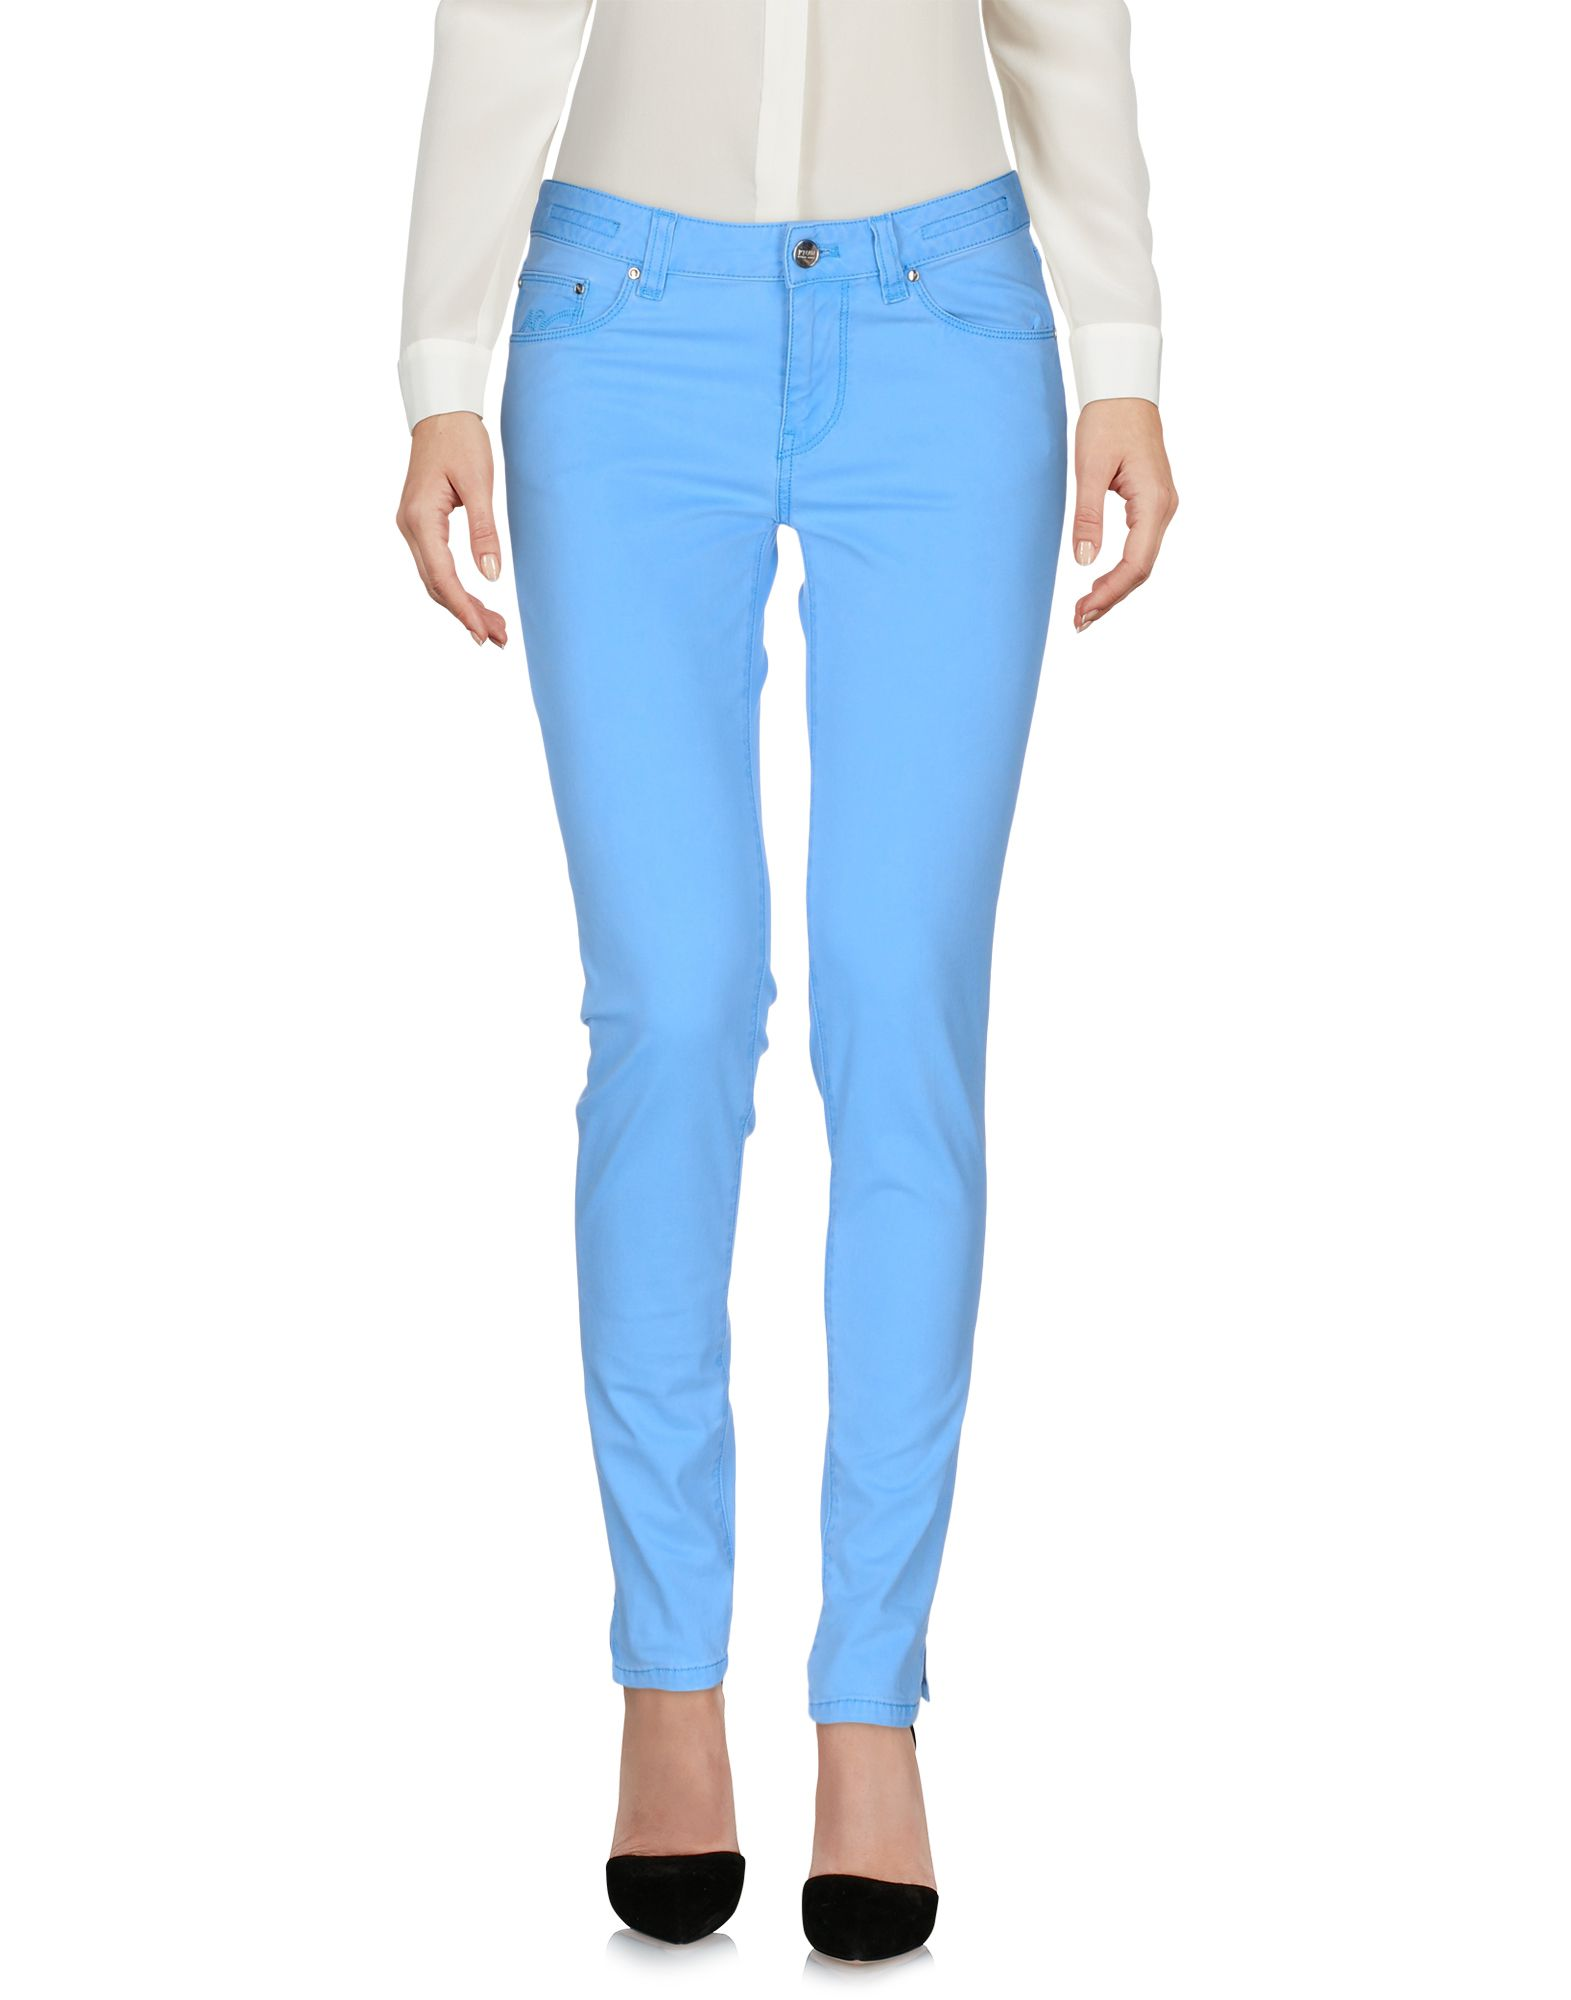 PT0W Casual Pants in Sky Blue